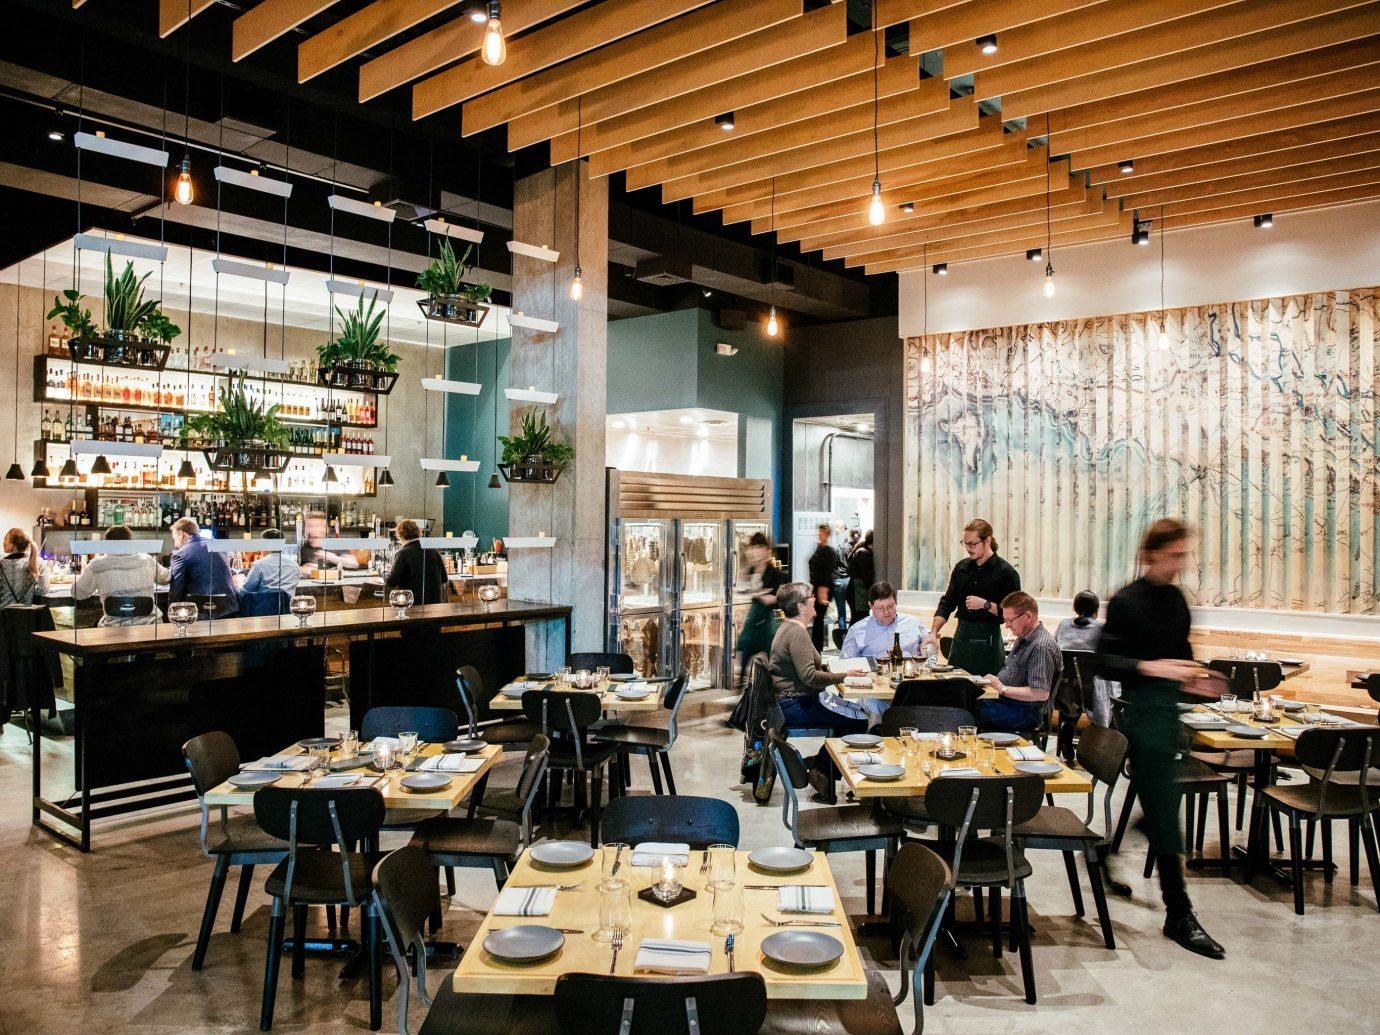 Boutique Hotels Hotels Trip Ideas table floor indoor restaurant ceiling interior design café coffeehouse cafeteria food court